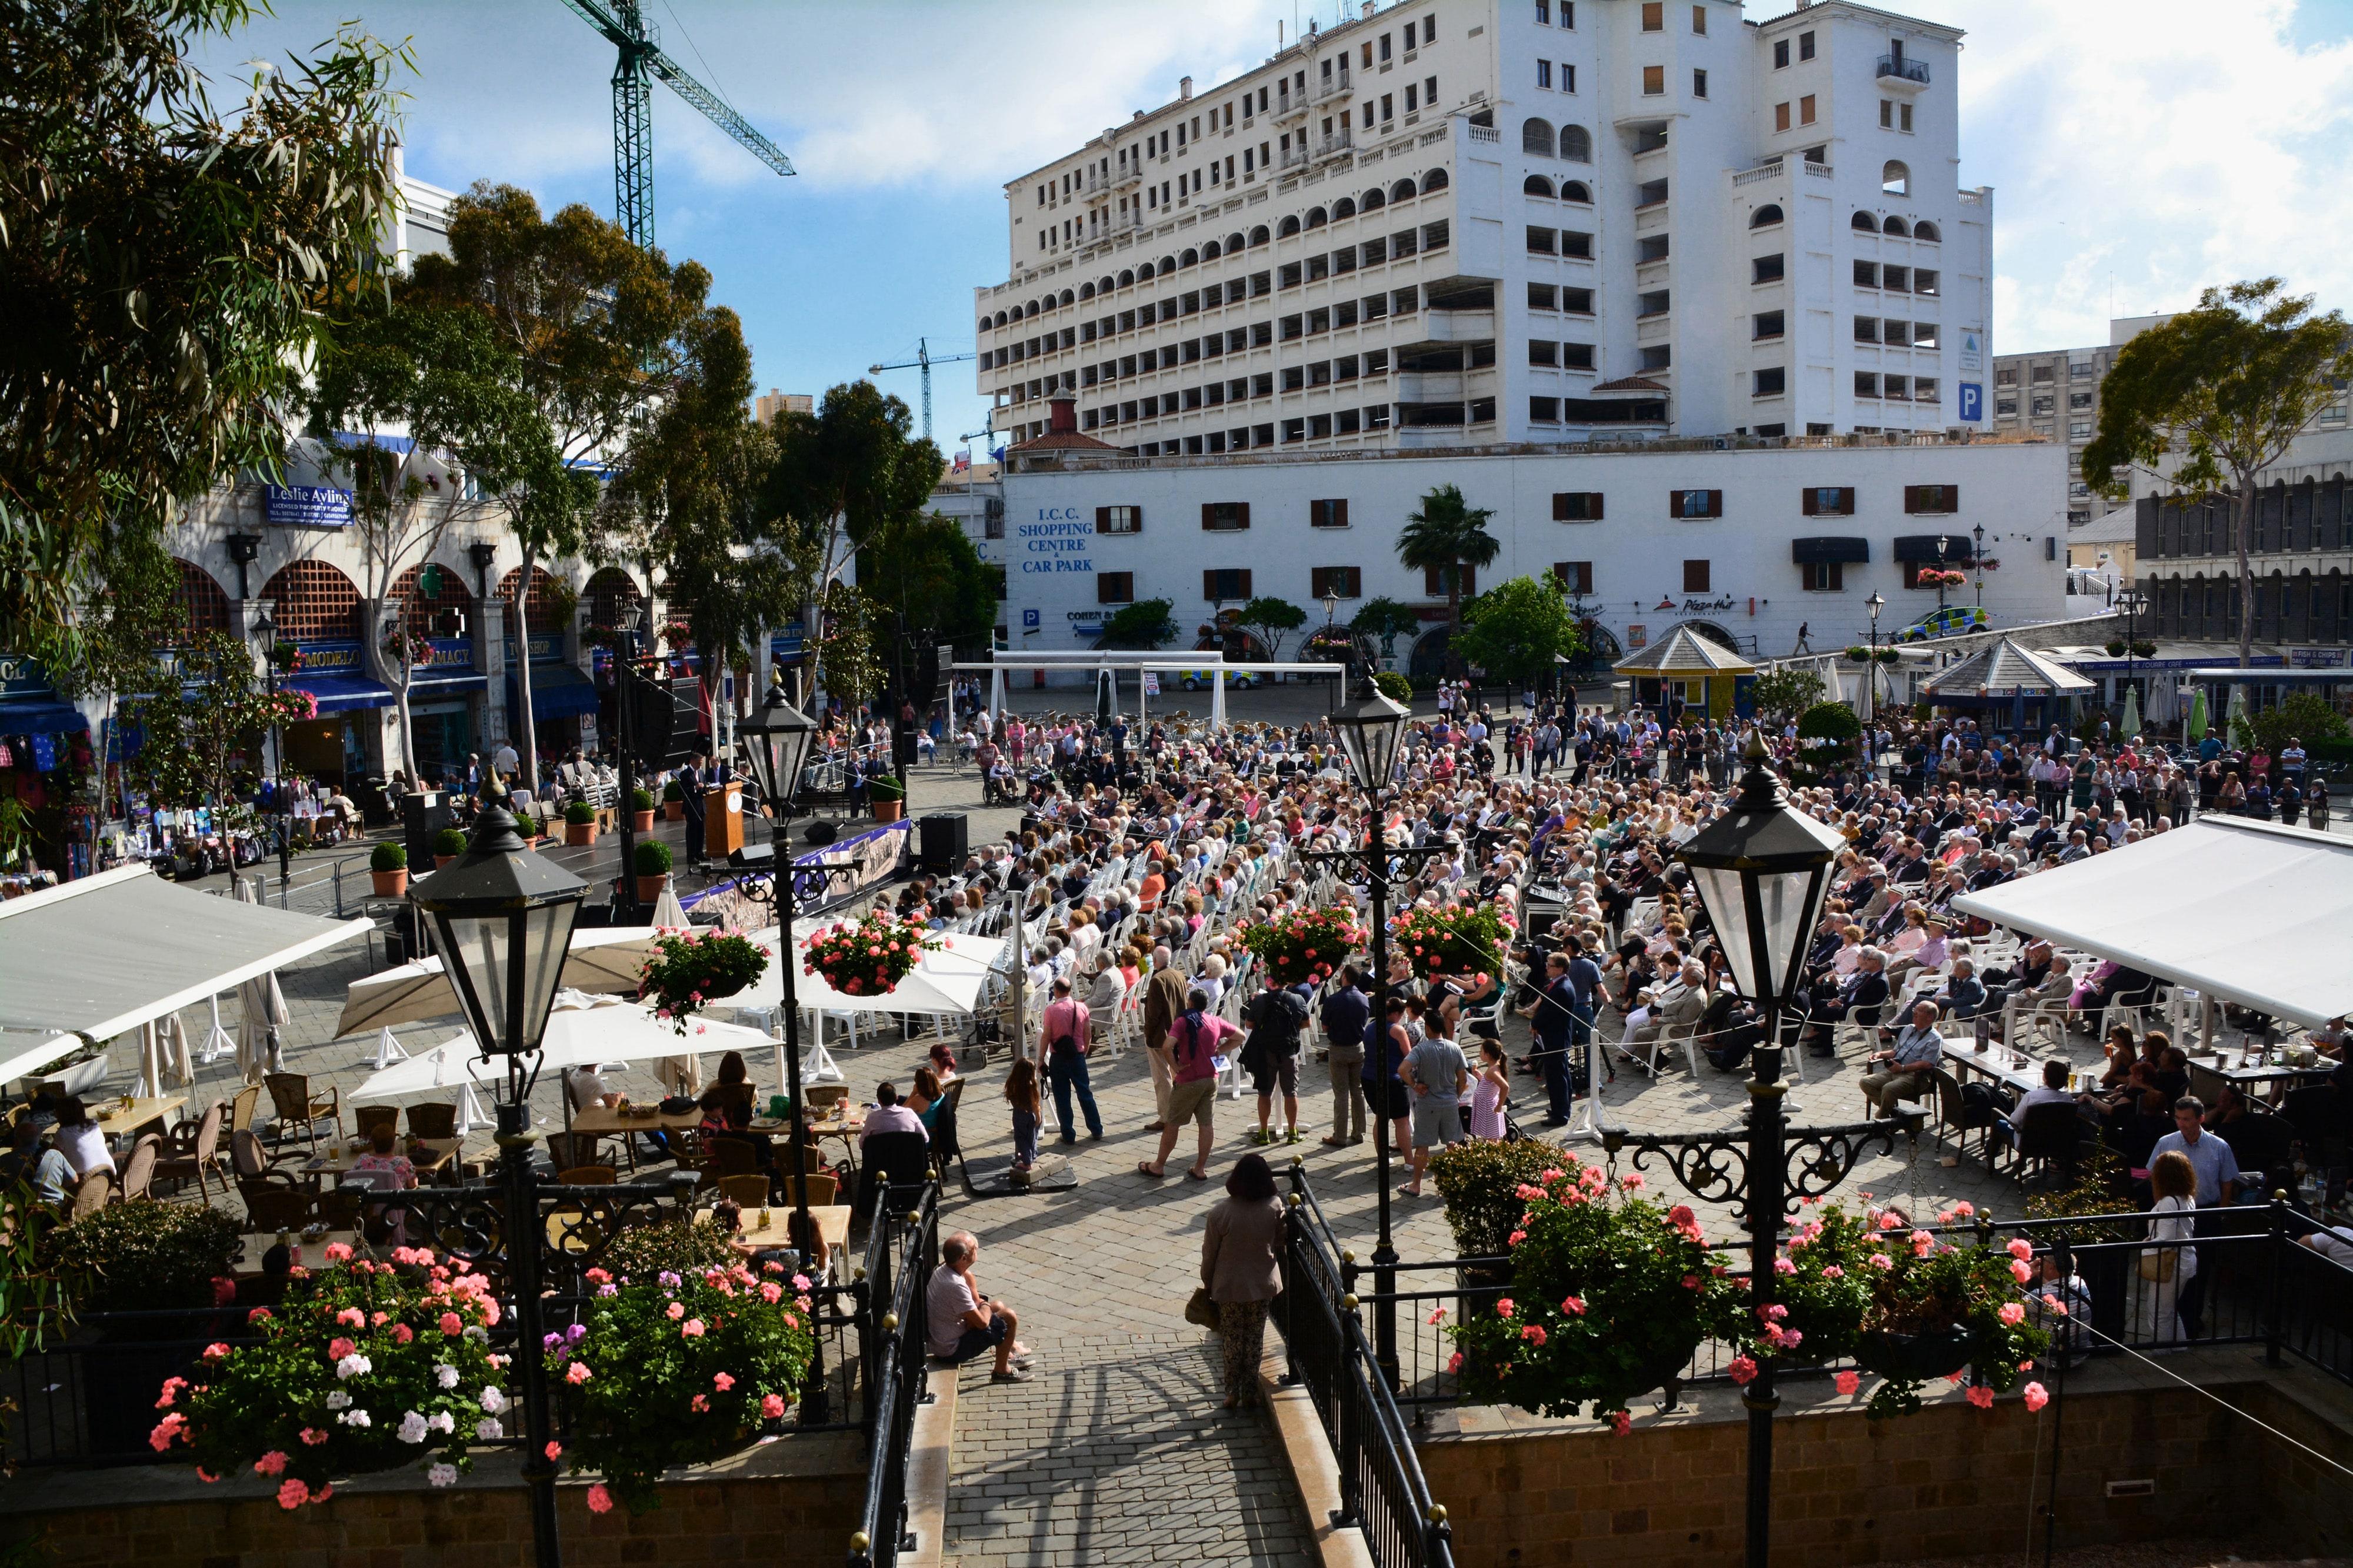 gibraltar-evacuation-dsc_3850_18005019881_o